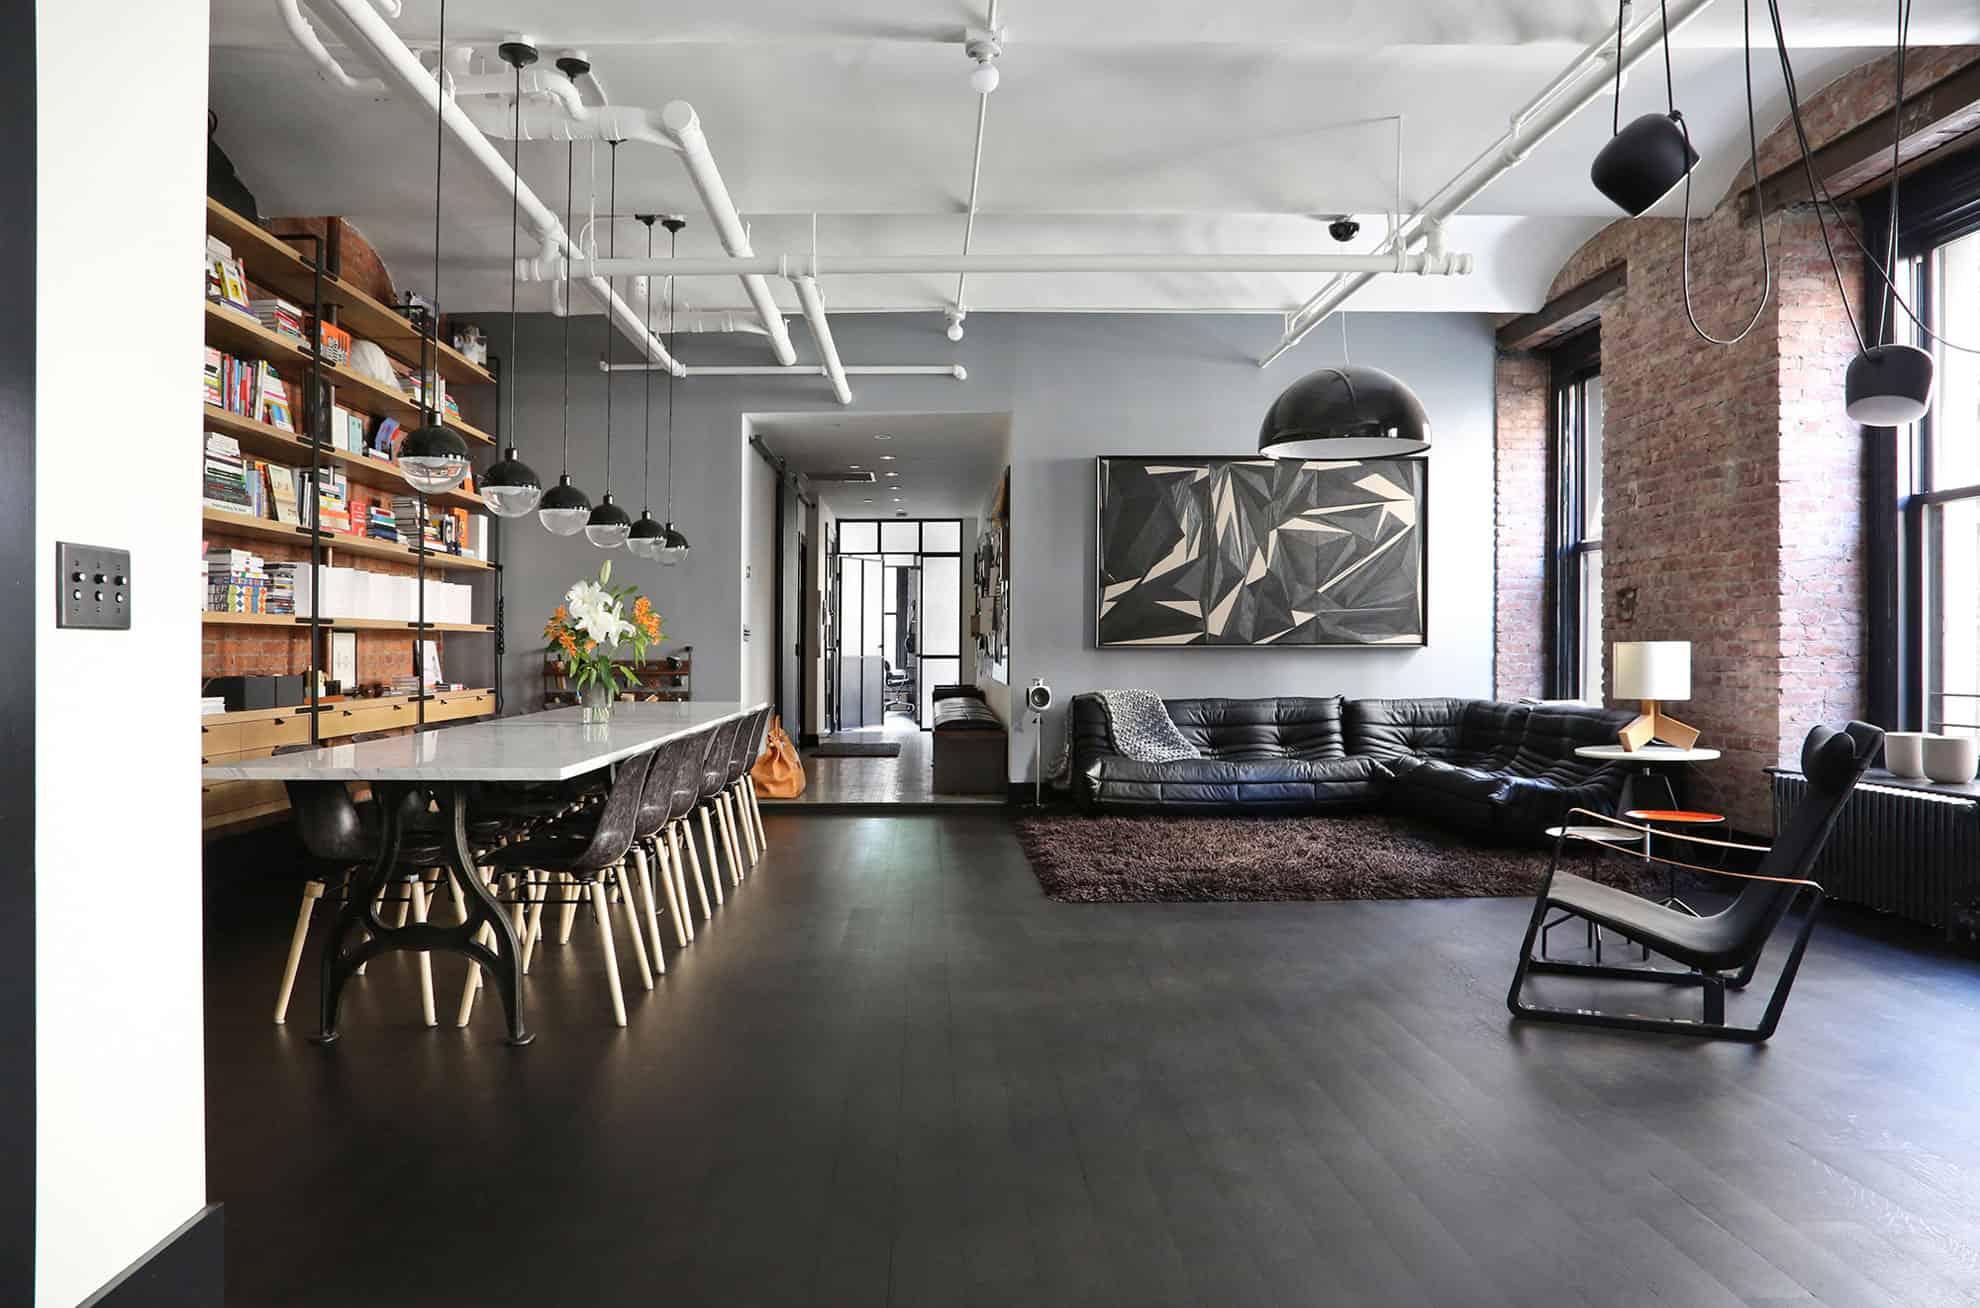 Studio Designs a Loft in a Former NoHo Factory